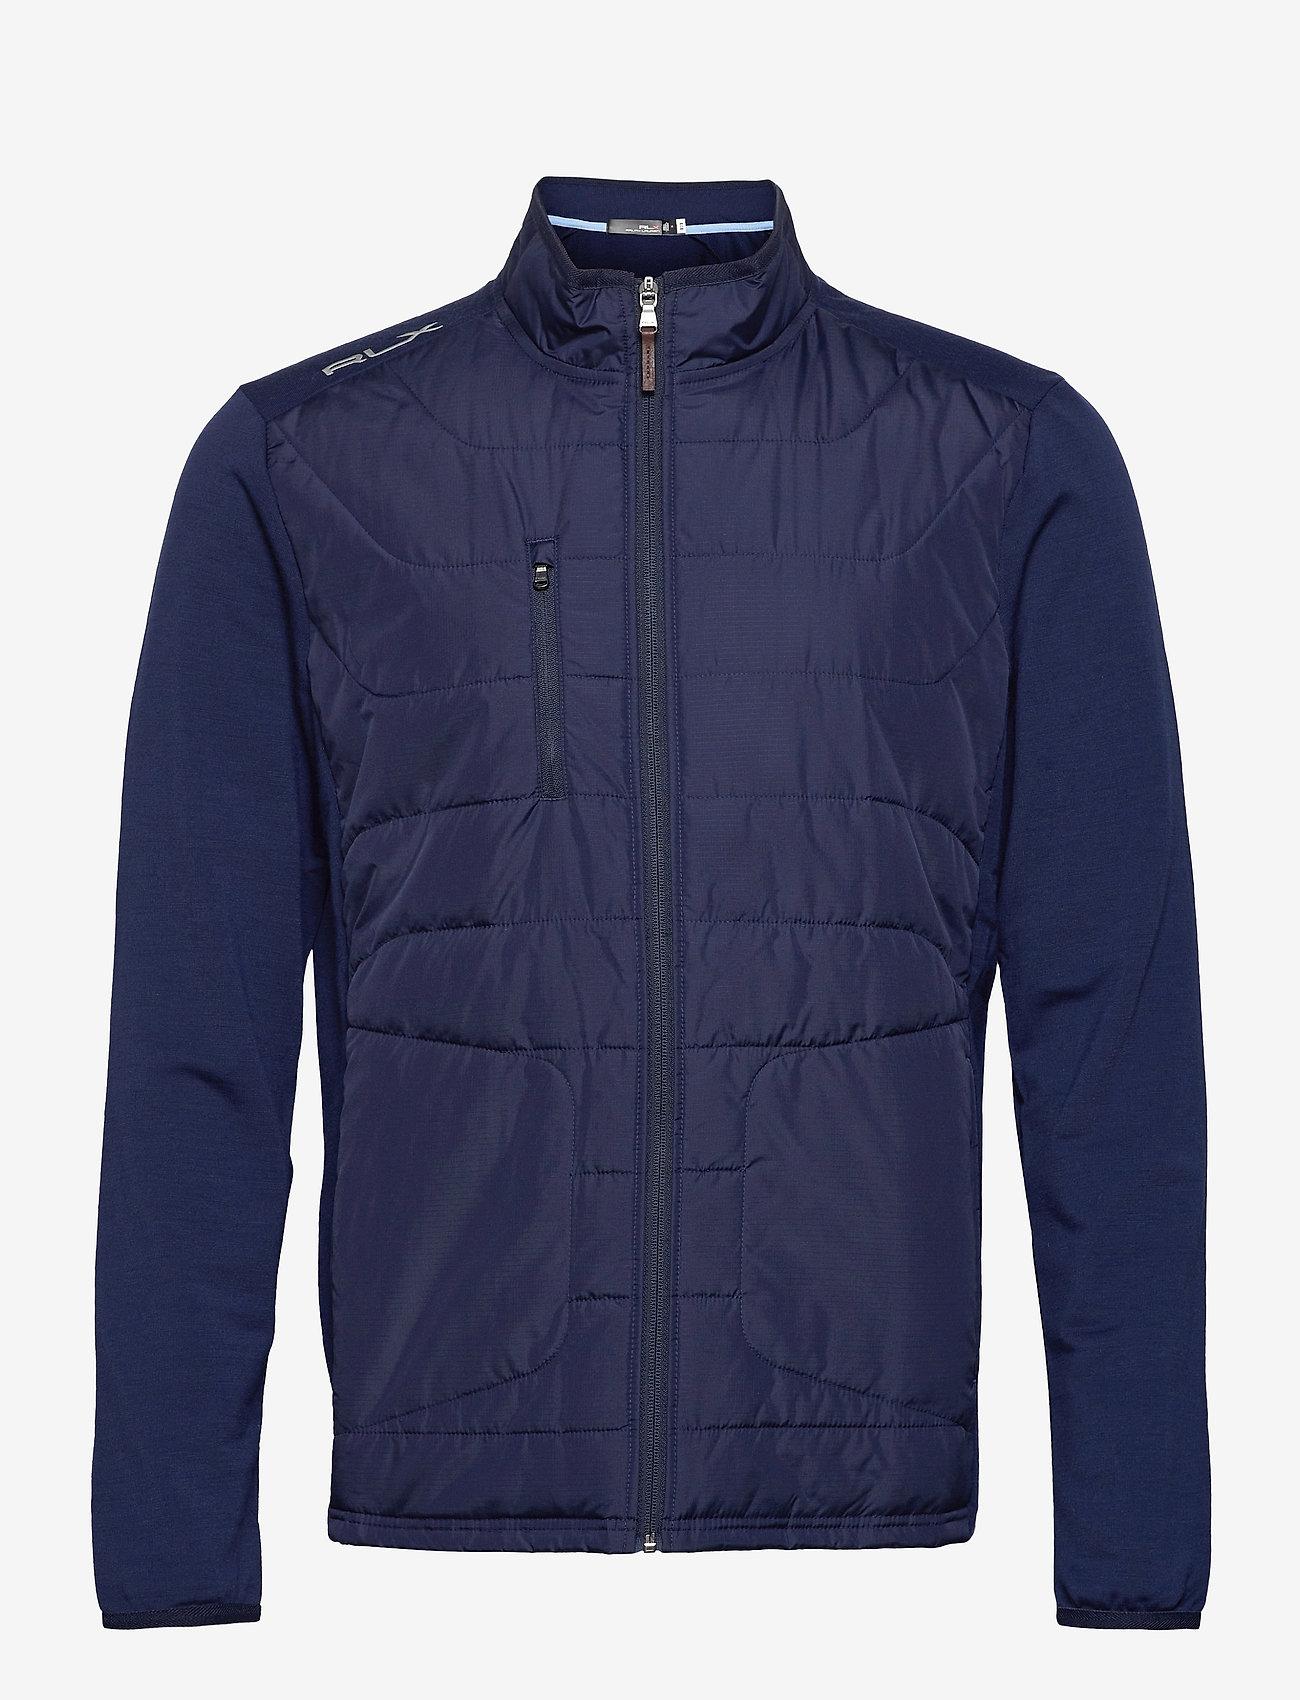 Ralph Lauren Golf - RECYCLED PERF WOOL-LS FZ MOCKNECK M - golf jackets - french navy - 0